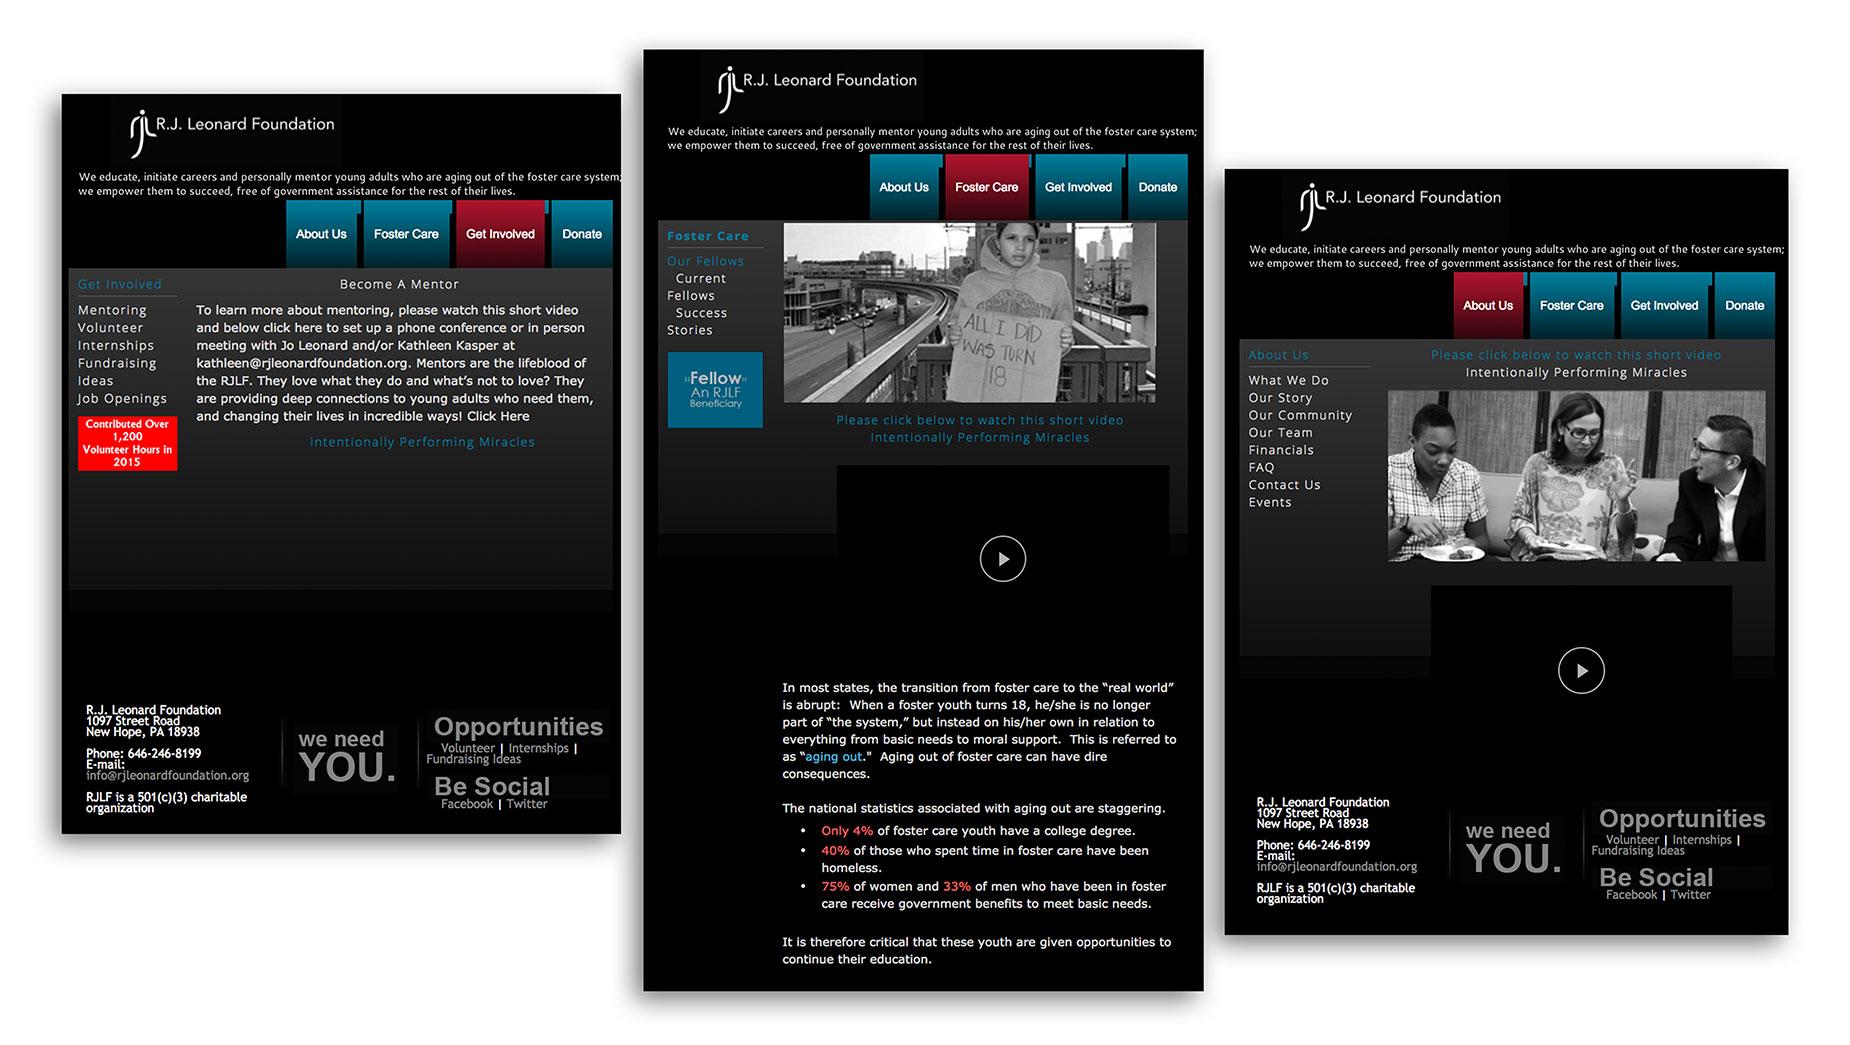 Old version of the RJLF website